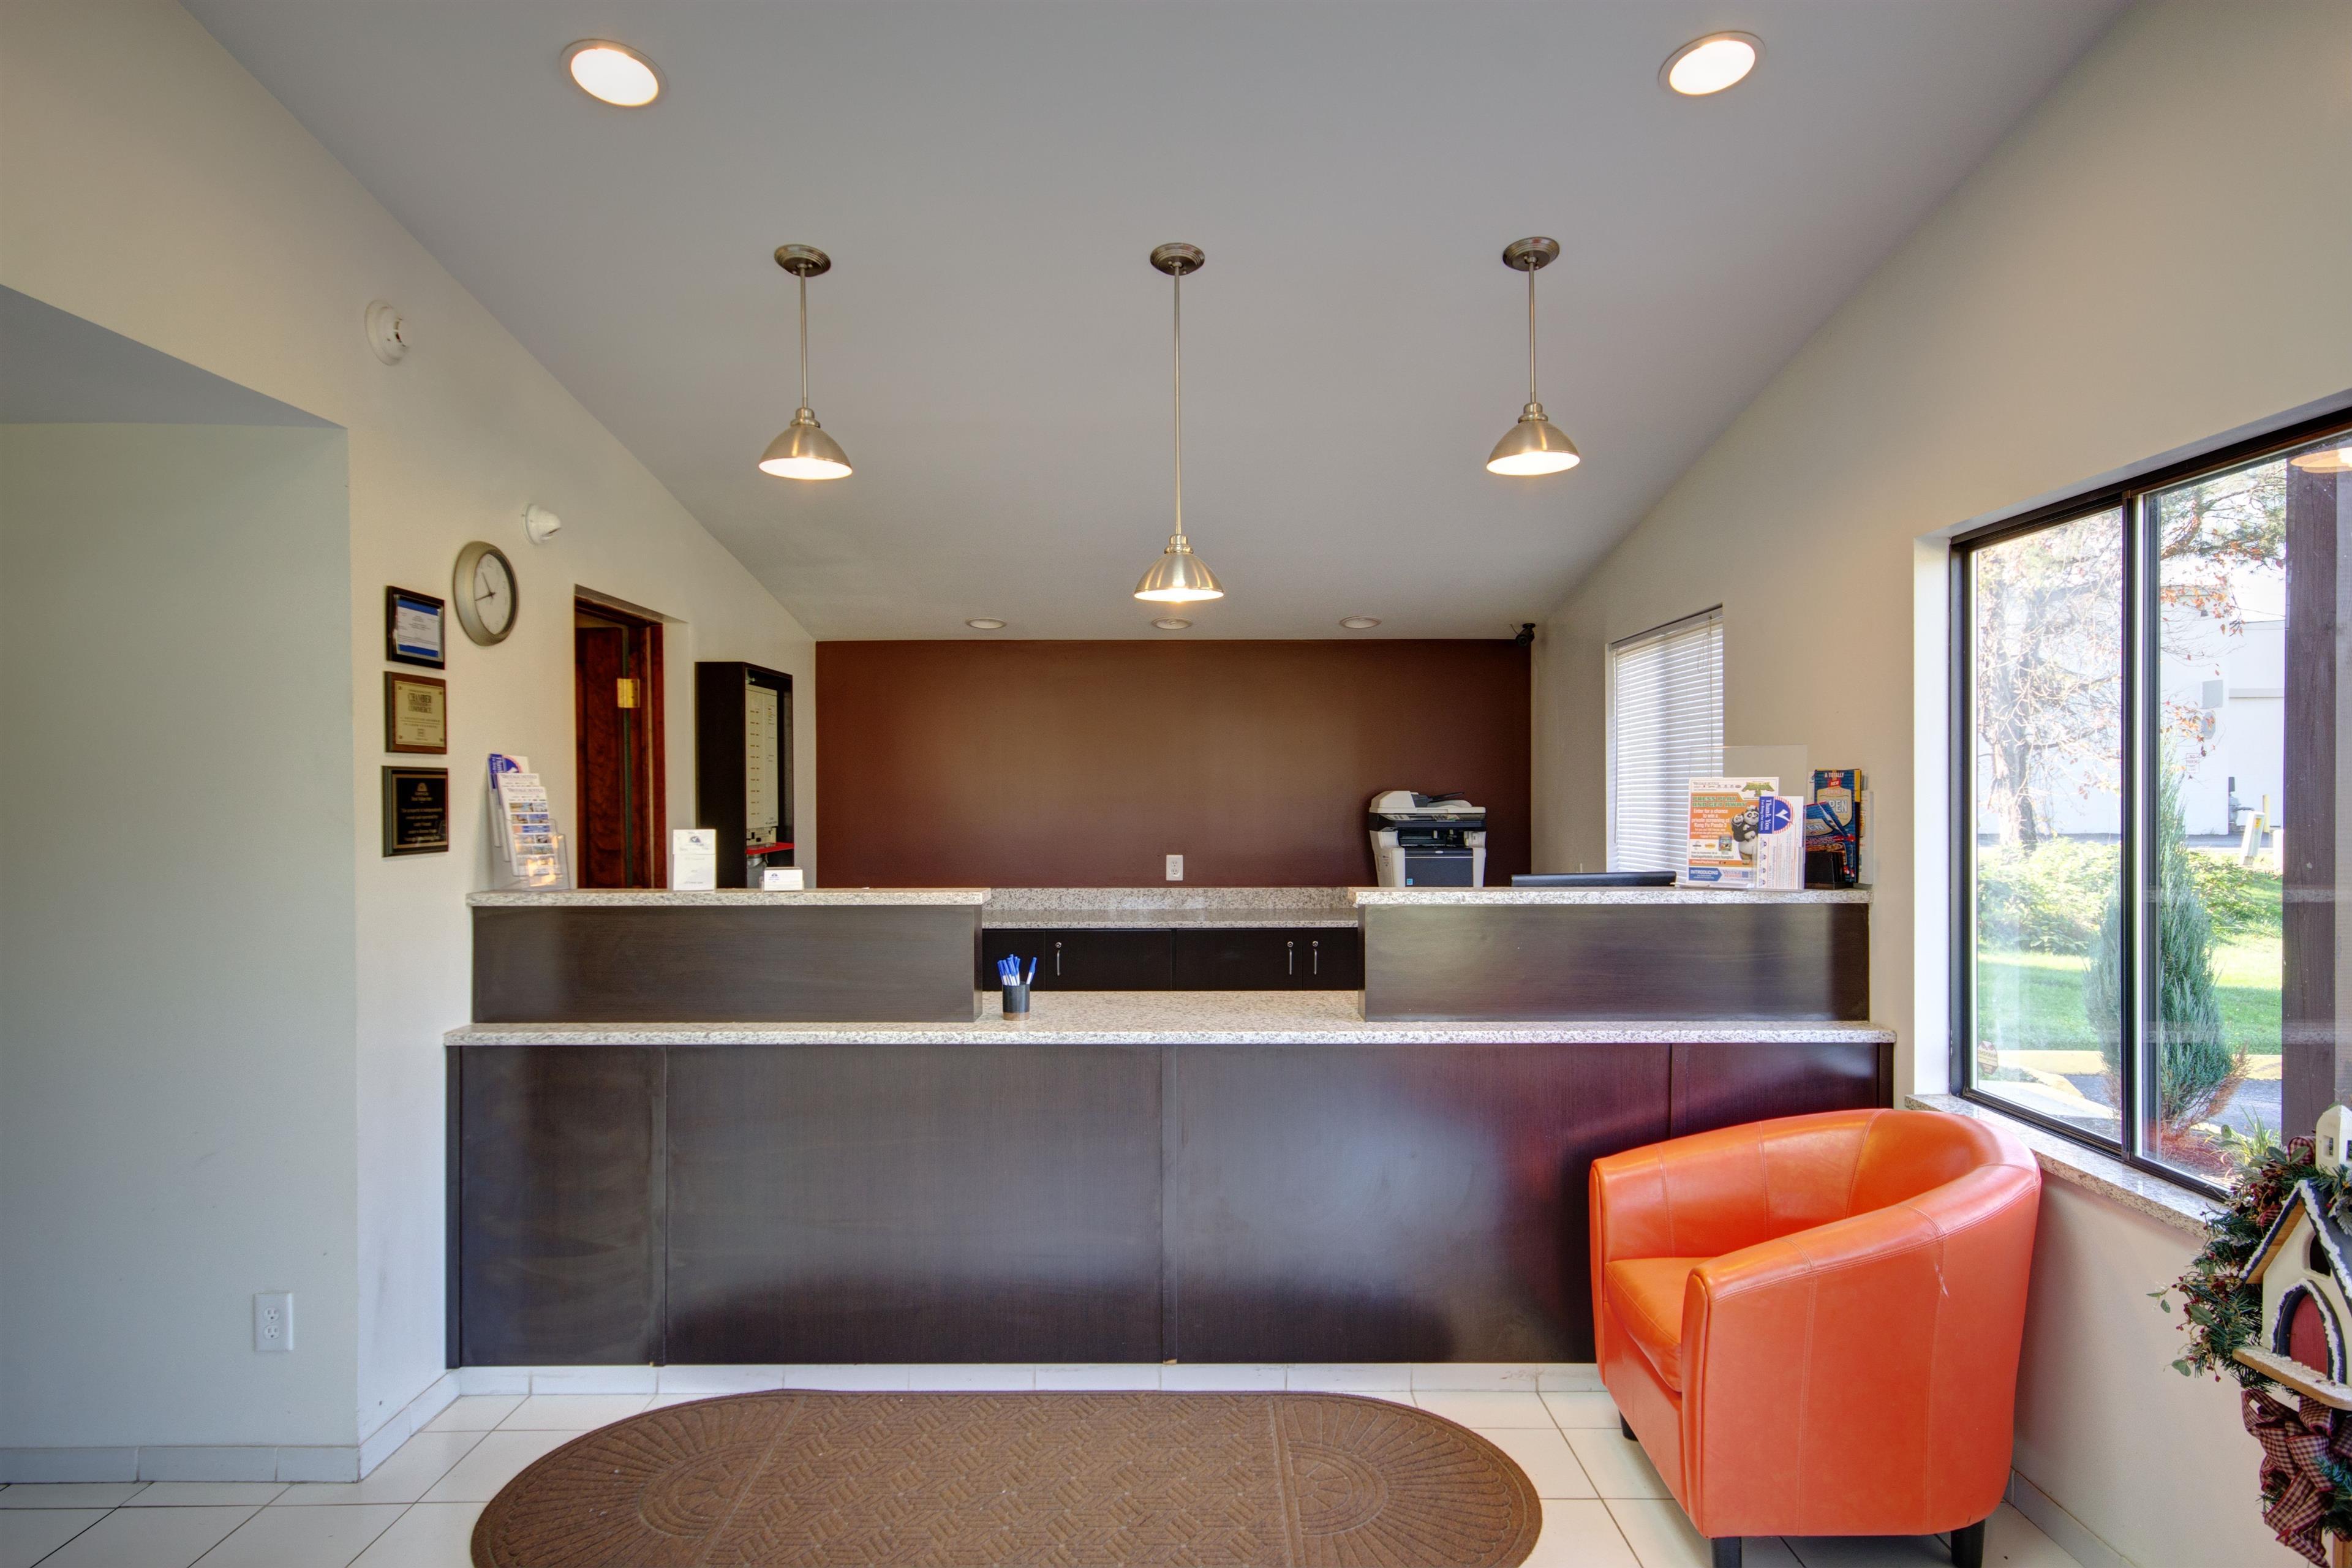 Americas Best Value Inn - Heath/Newark image 4